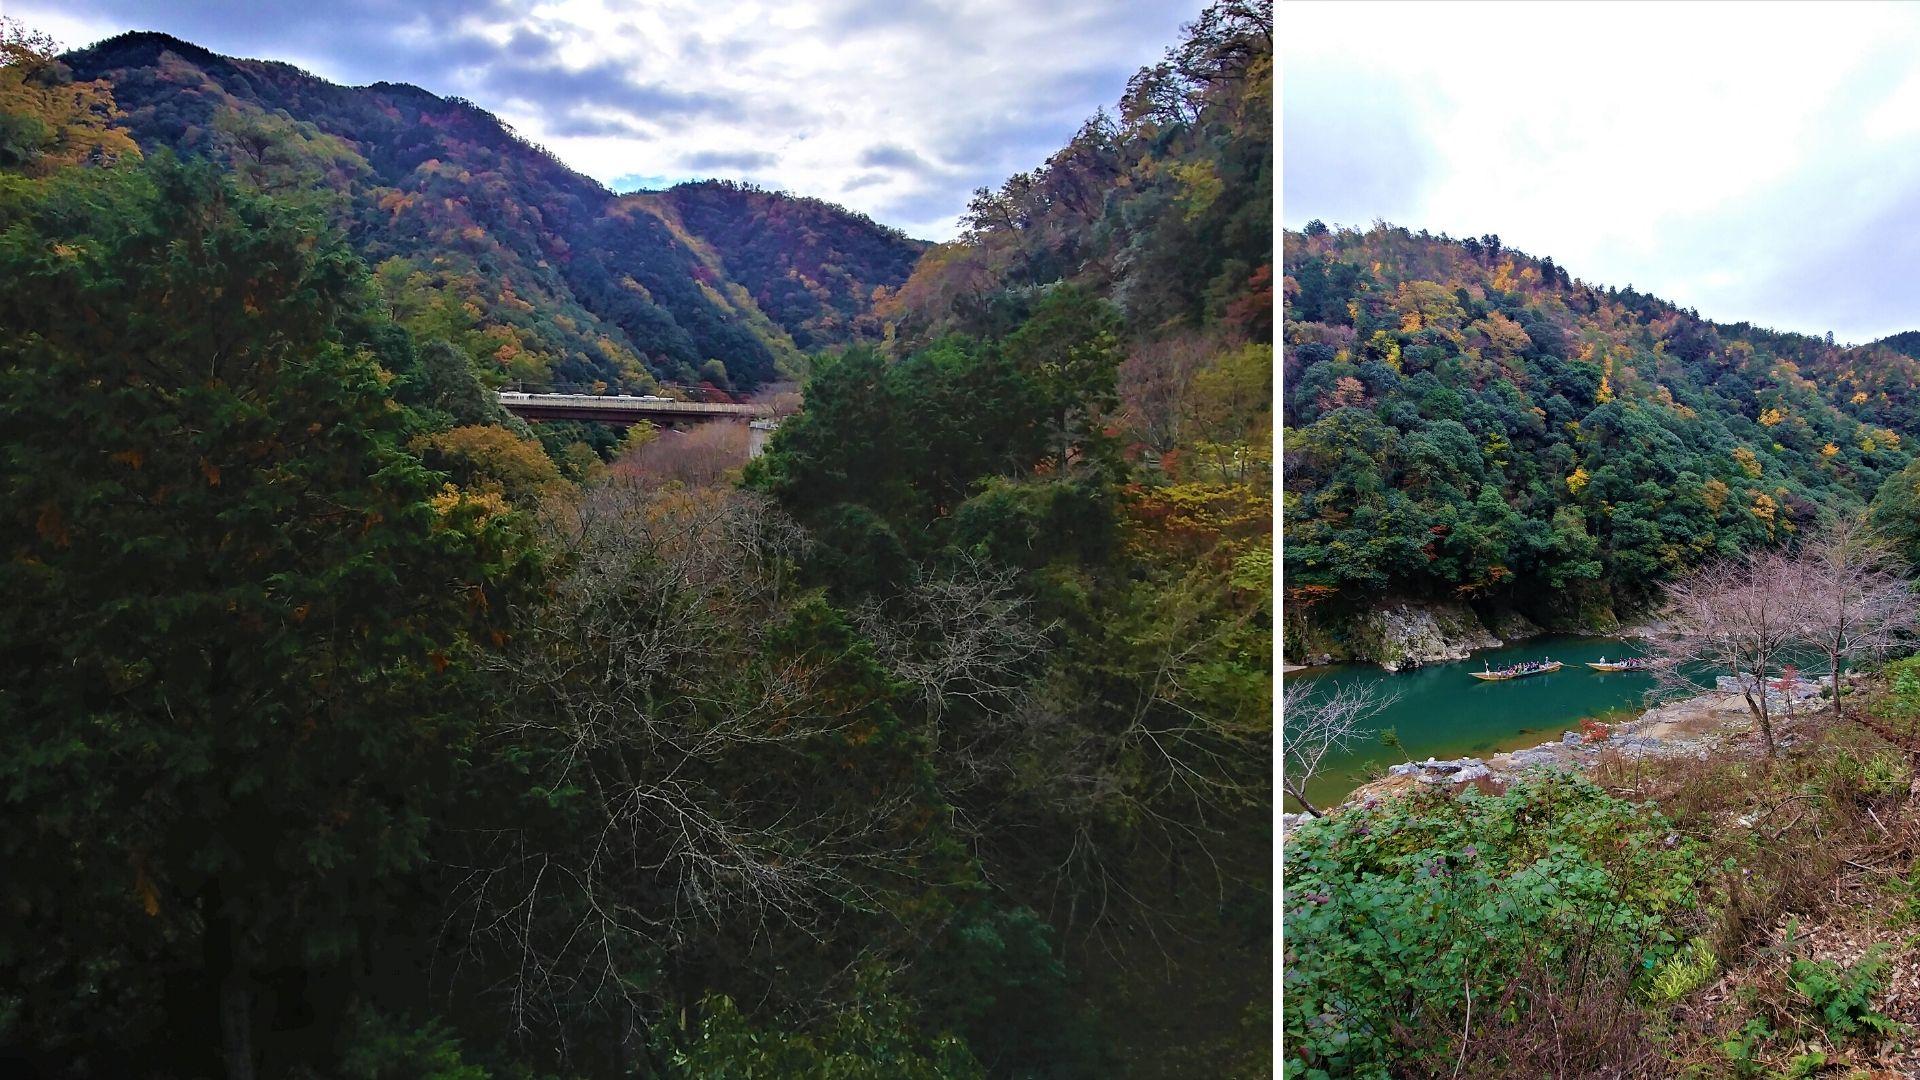 kyoto hozukyo randonnee blog voyage japon arpenter le chemin